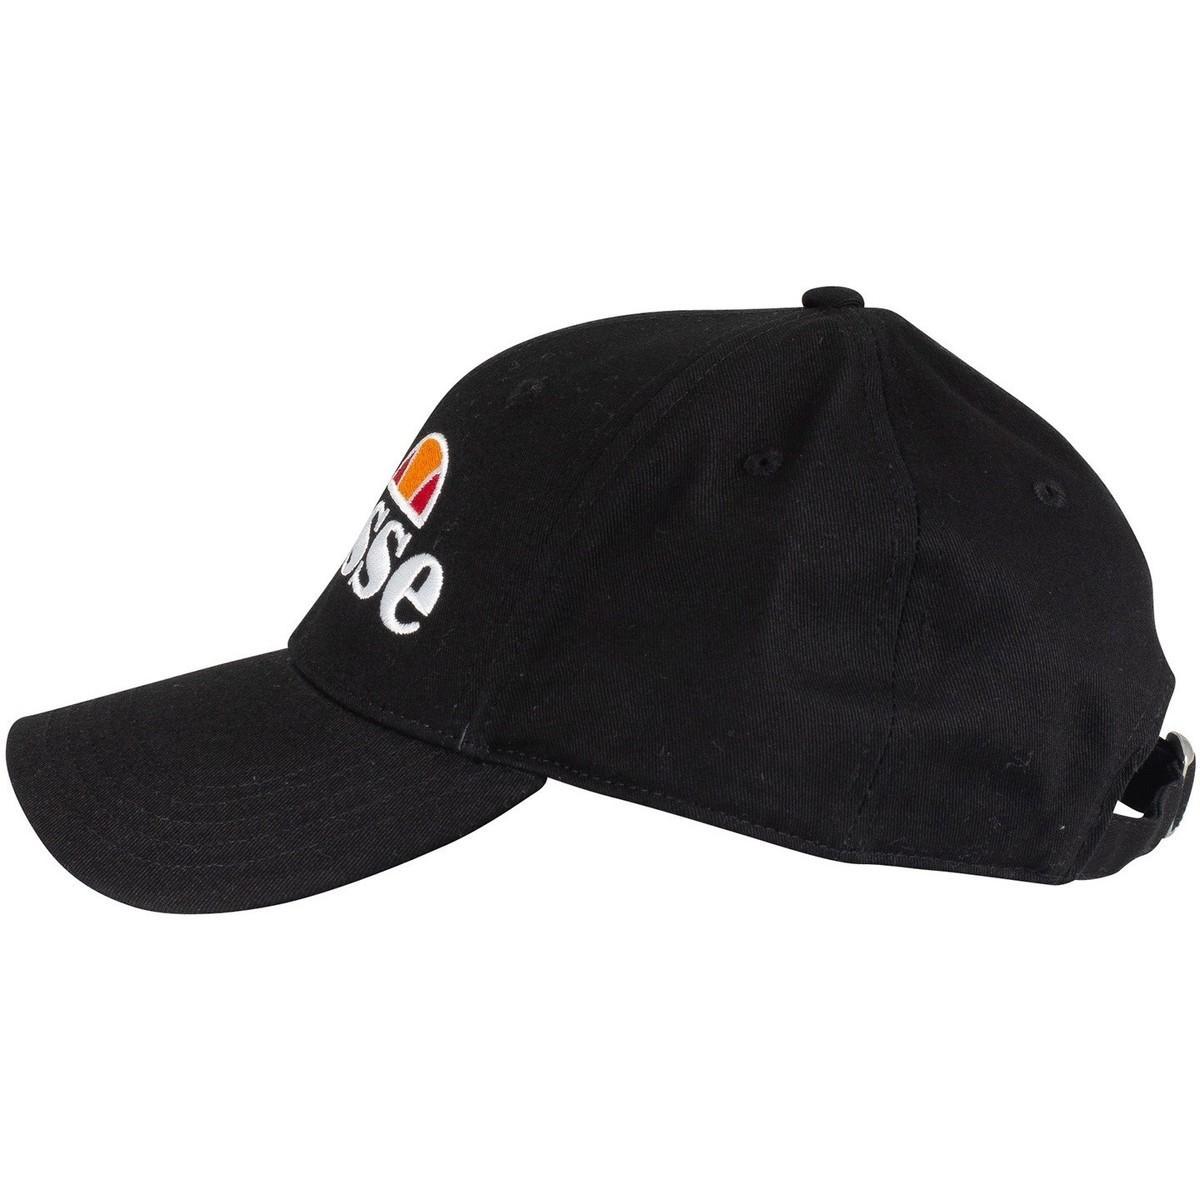 5e5dd4cc31a Ellesse Black Ragusa Cap in Black for Men - Save 26% - Lyst